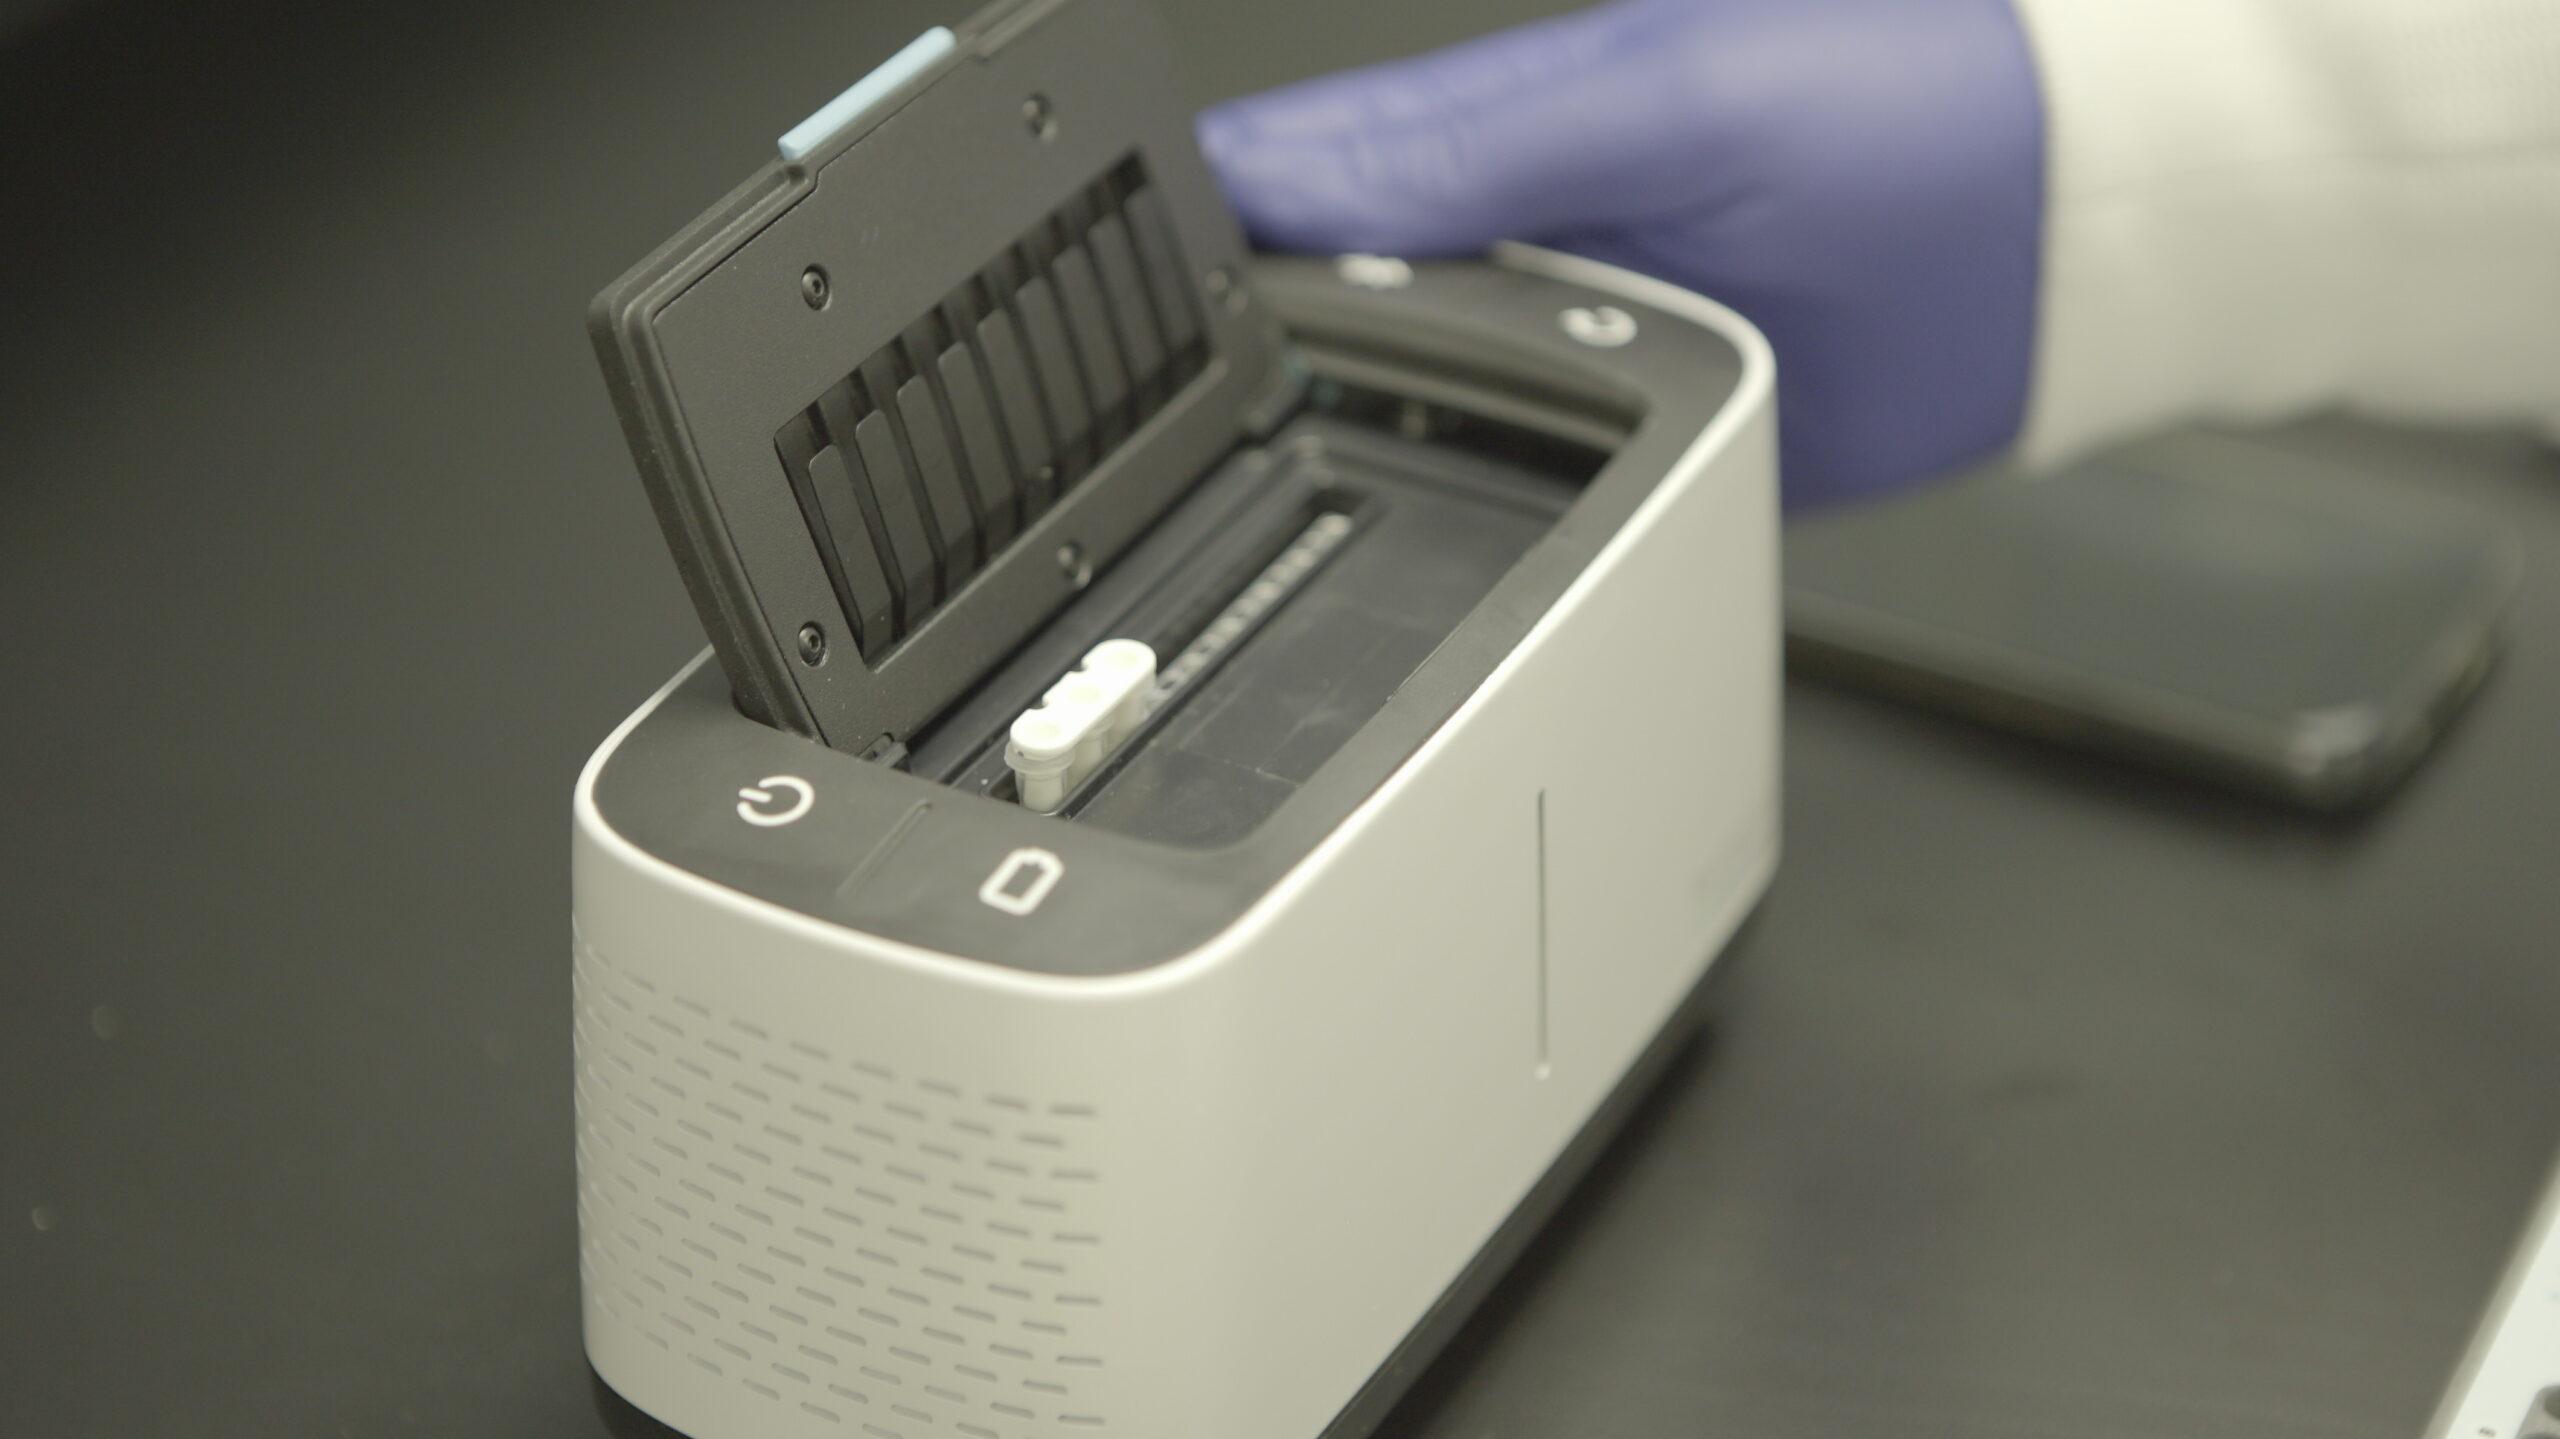 lab testing item